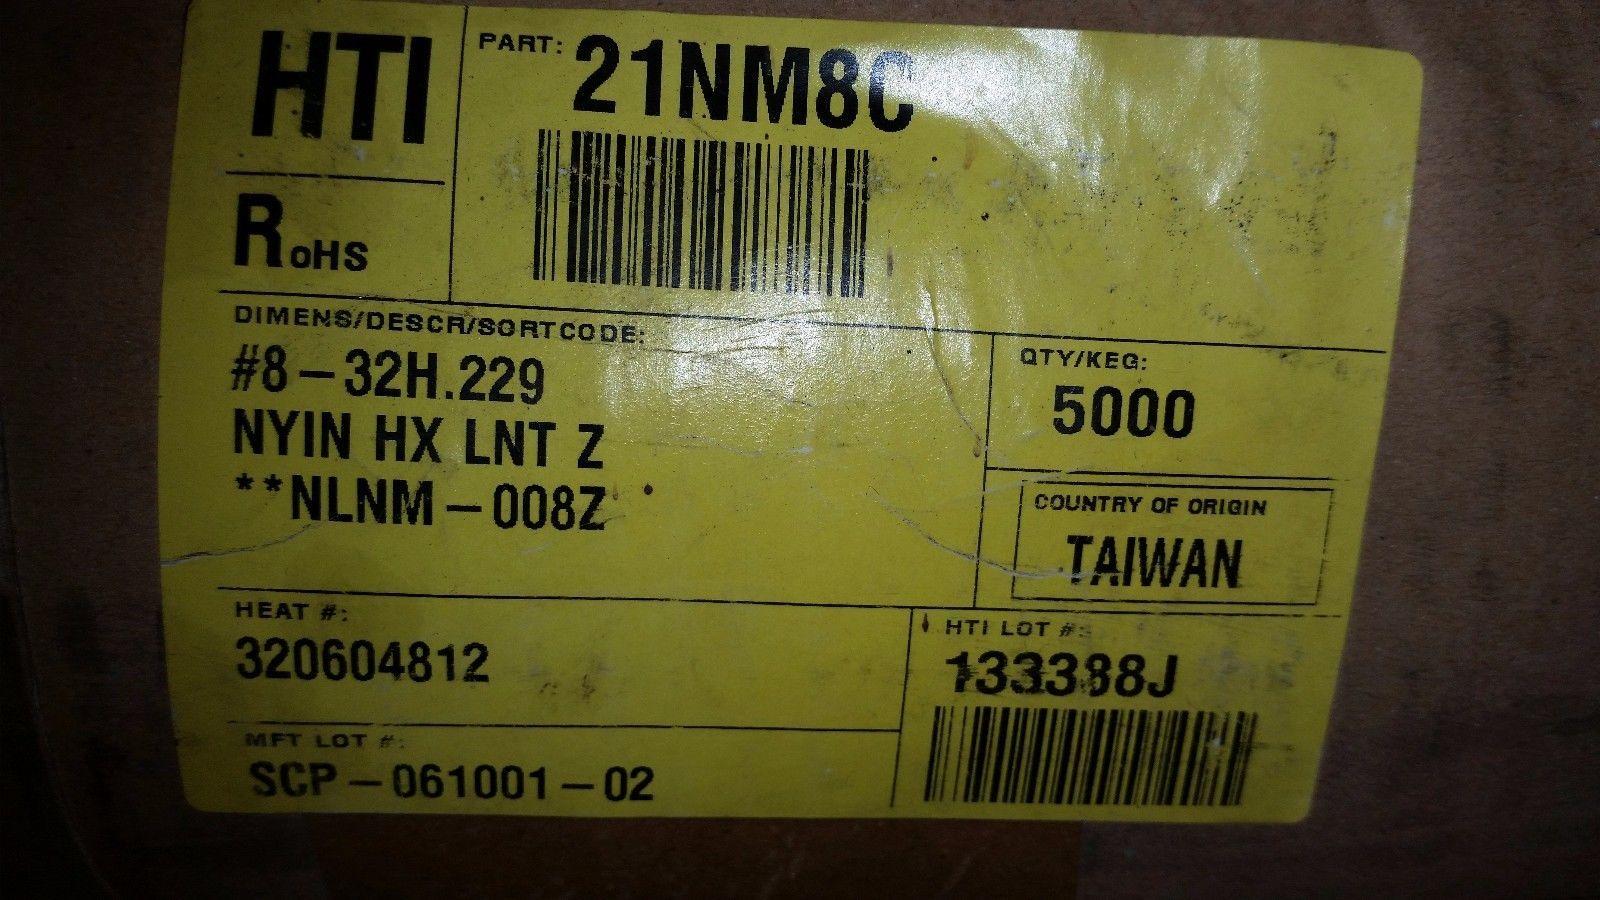 5000 pcs Nylock #8 Hex Machine Nuts 8-32 Zinc Plated Nyloc nylon insert free shp